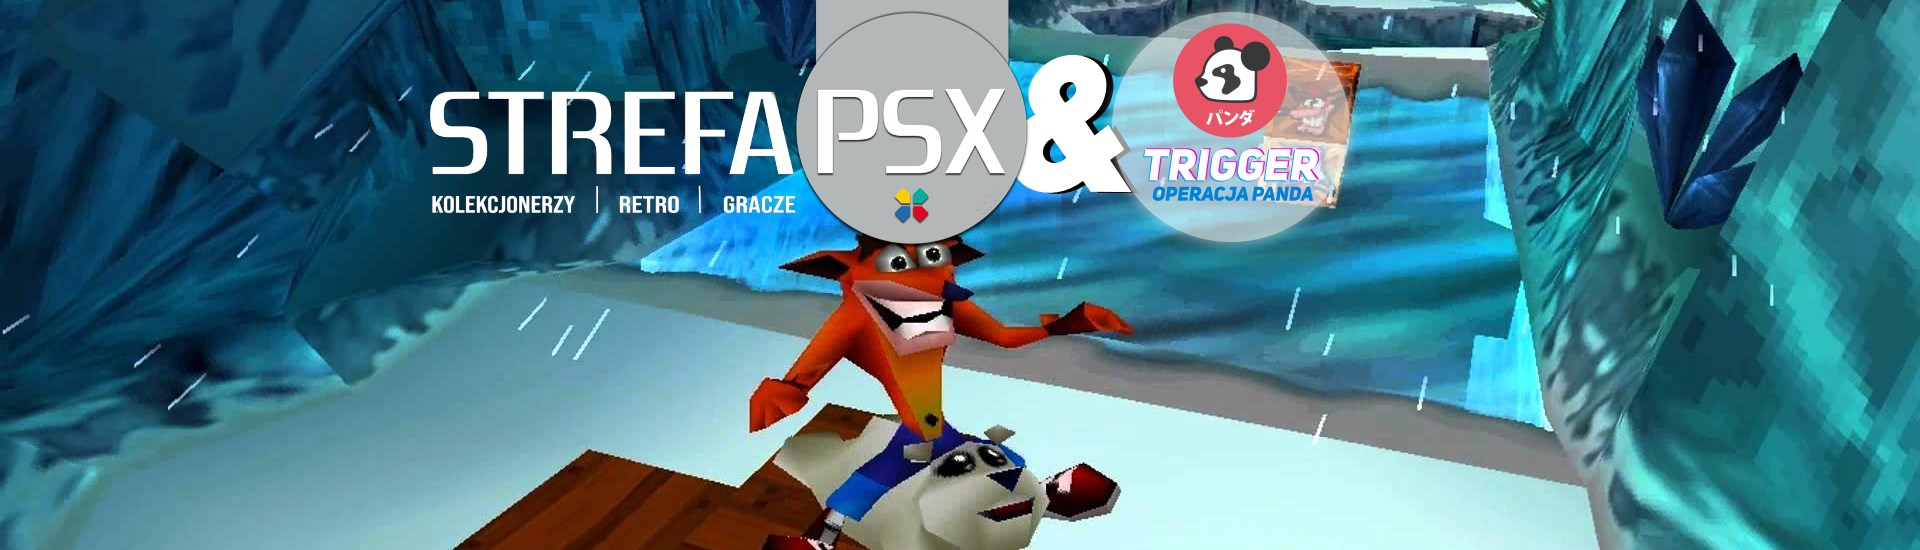 Magia Playstation 1